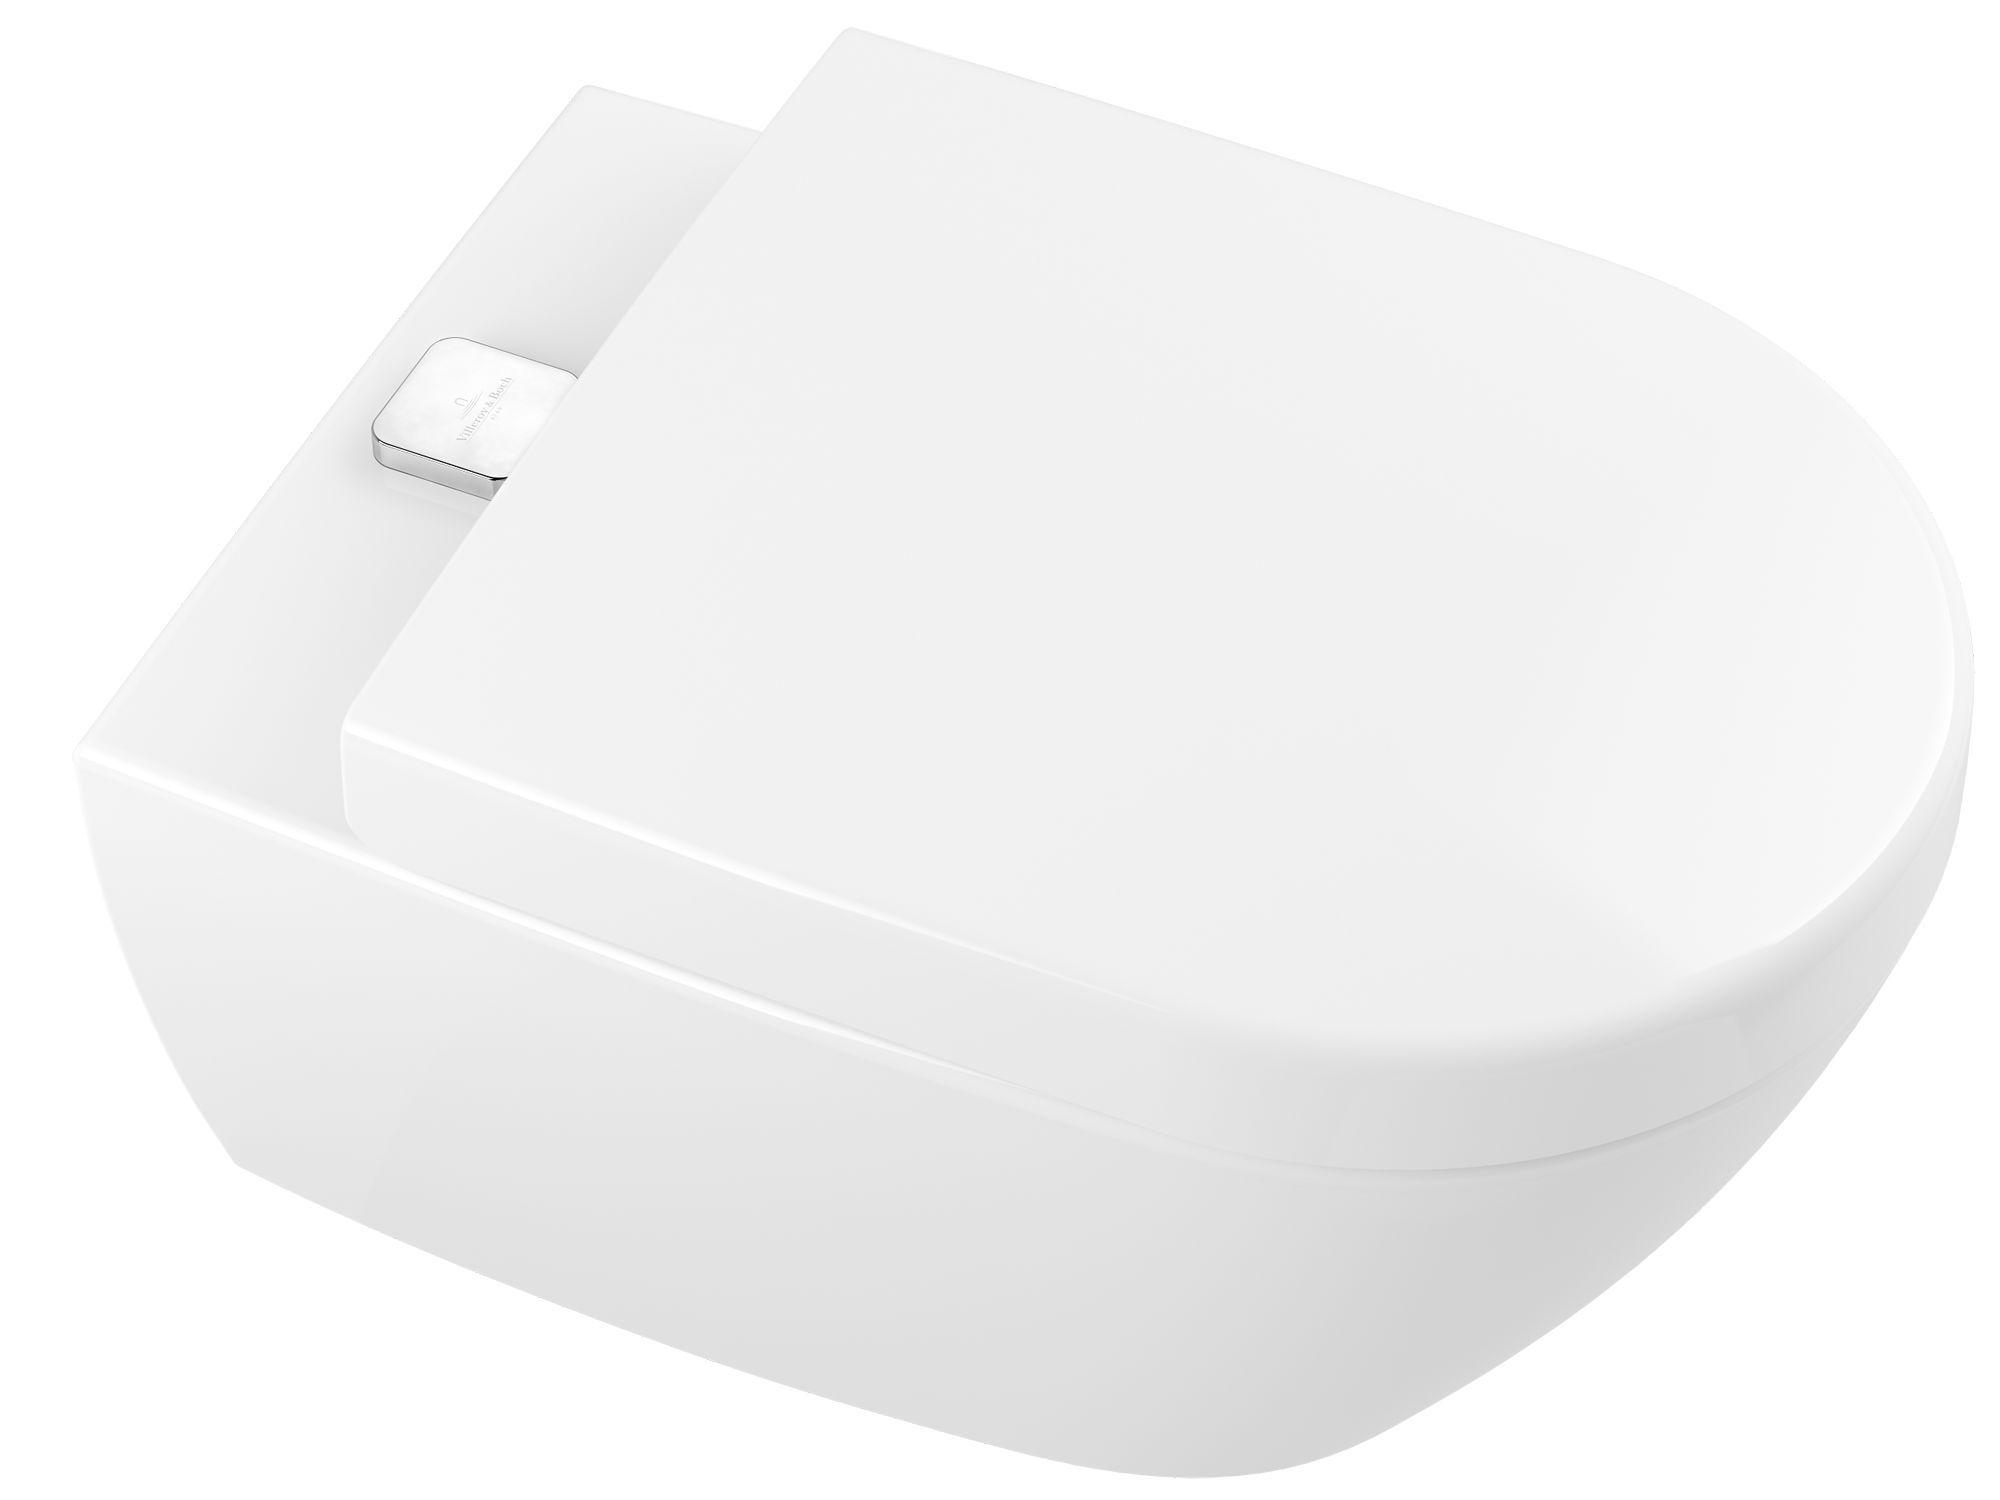 Villeroy & Boch Subway 2.0 ViFresh Wand-Tiefspül-WC spülrandlos L:56xB:37cm DirectFlush mit offenem Spülrand weiß mit CeramicPlus 5614A1R1